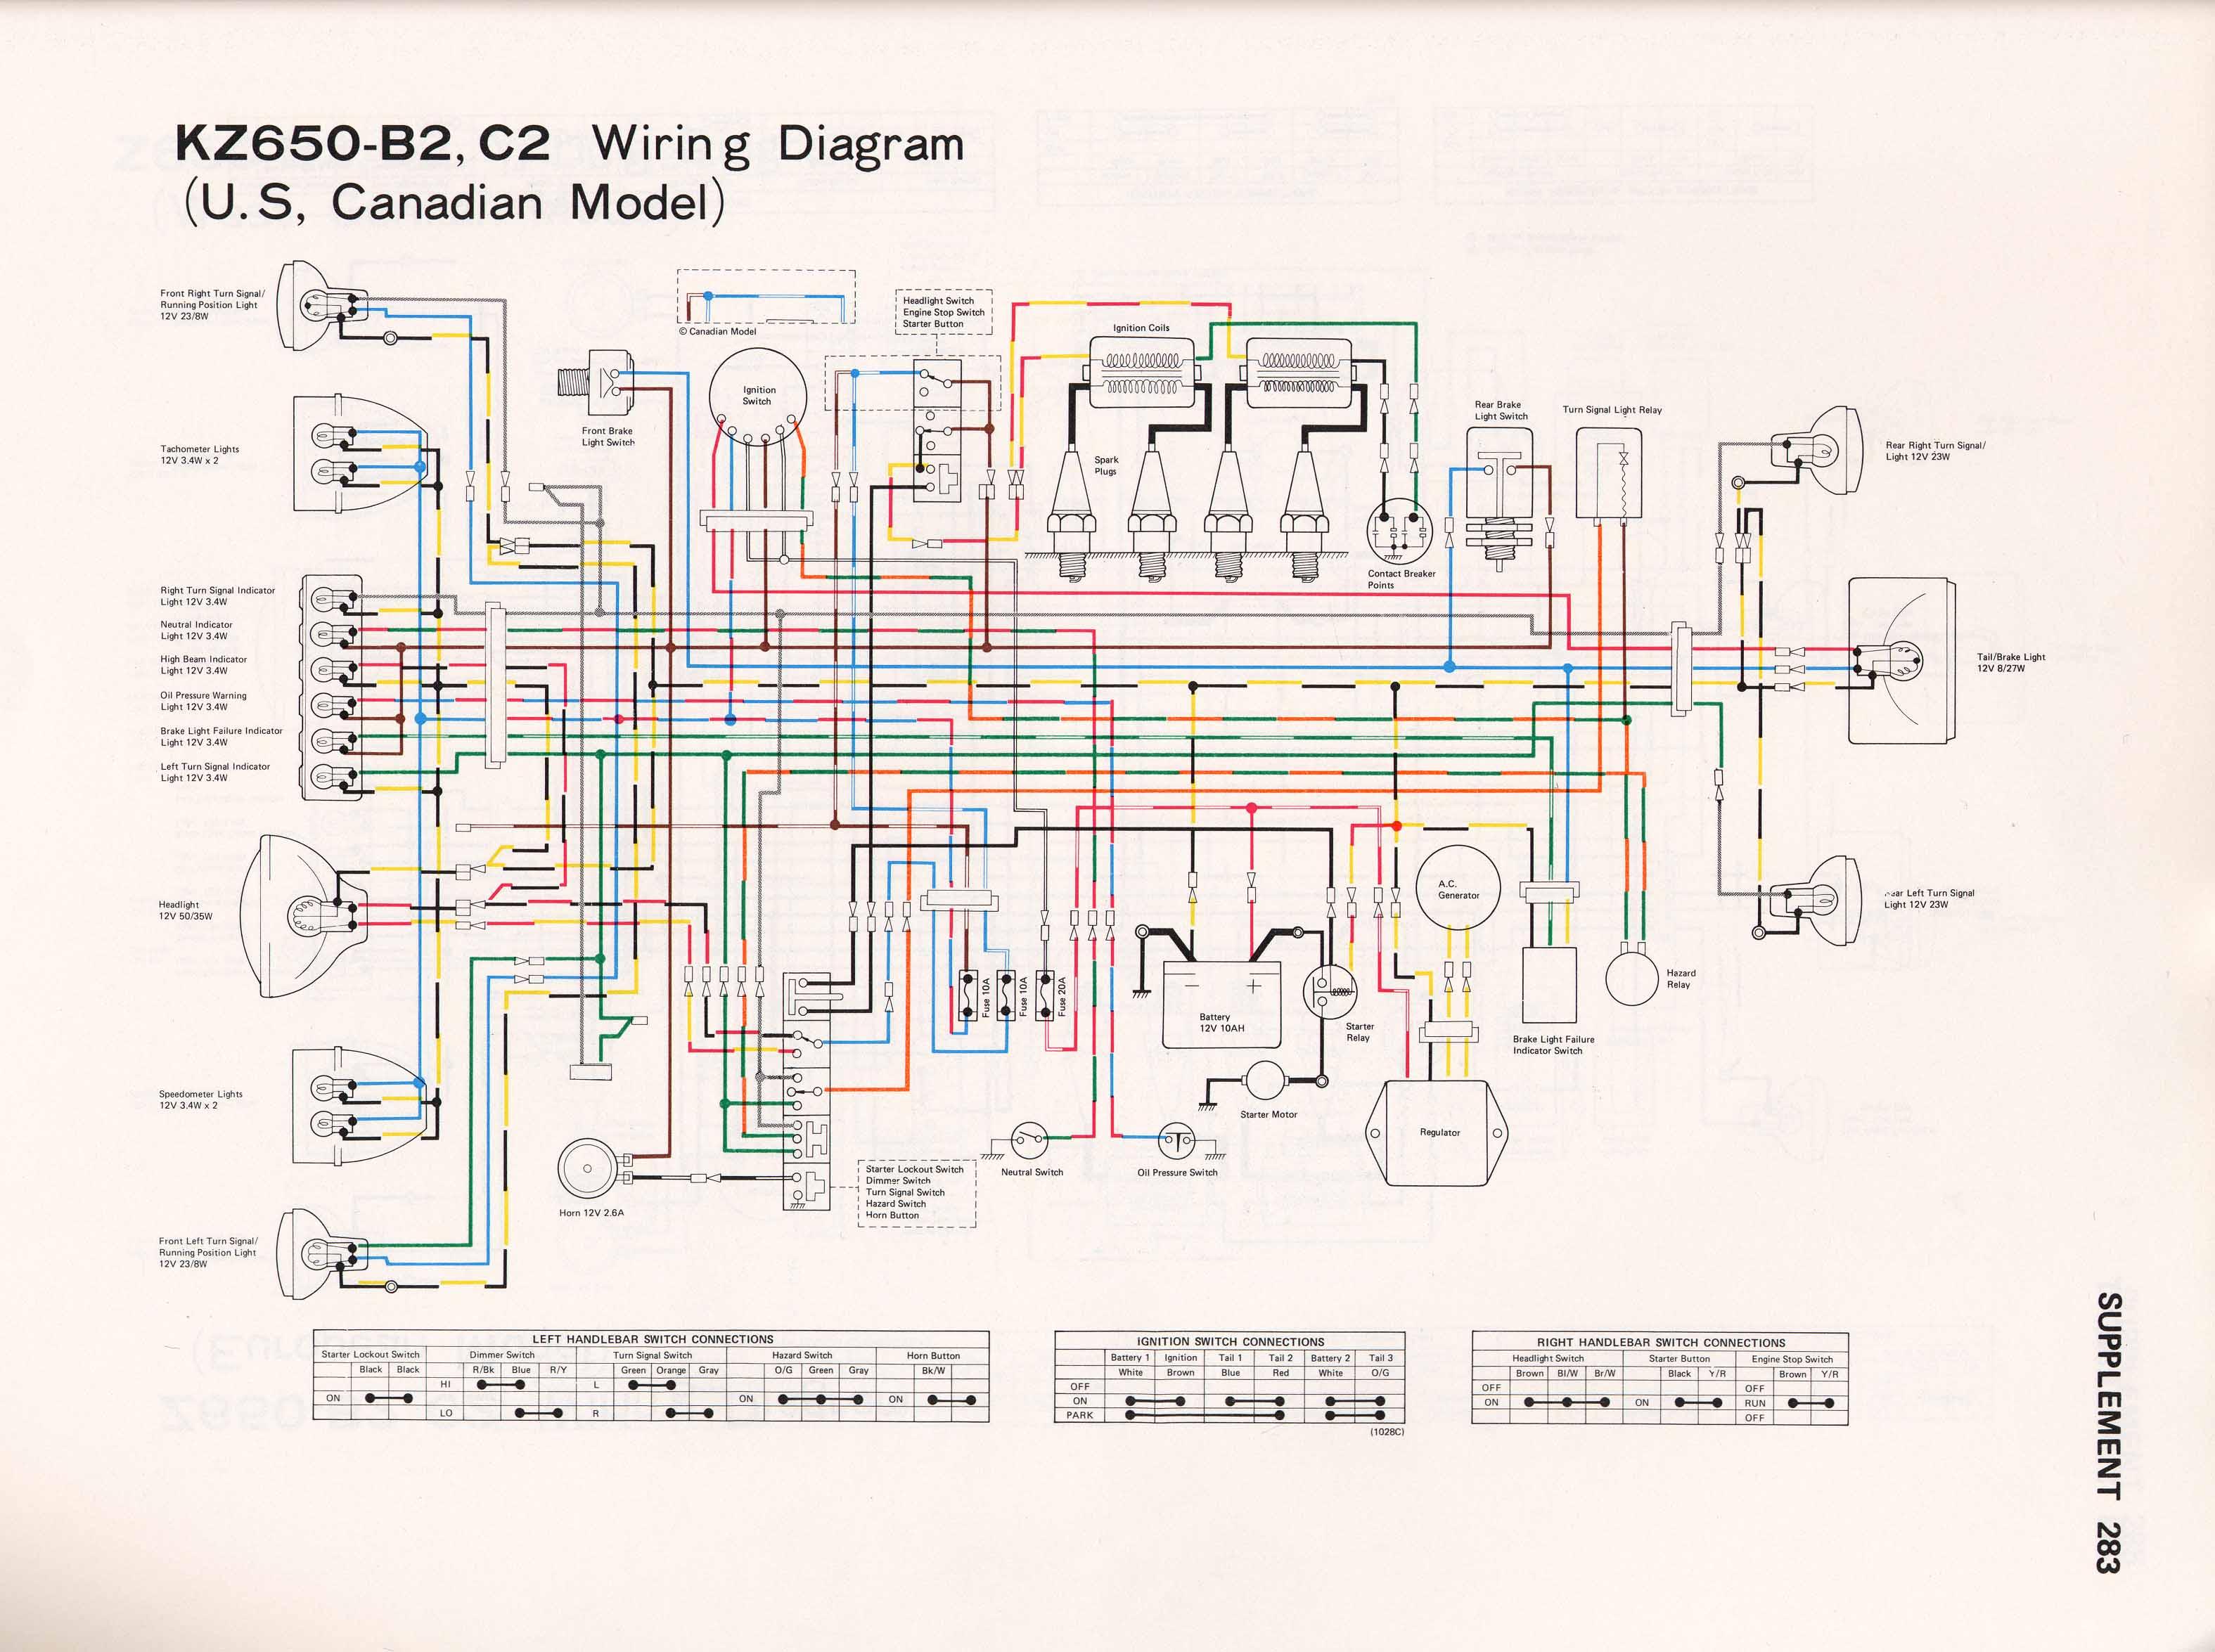 Peachy 82 Gpz750 Wiring Diagram Wiring Library Wiring Cloud Biosomenaidewilluminateatxorg